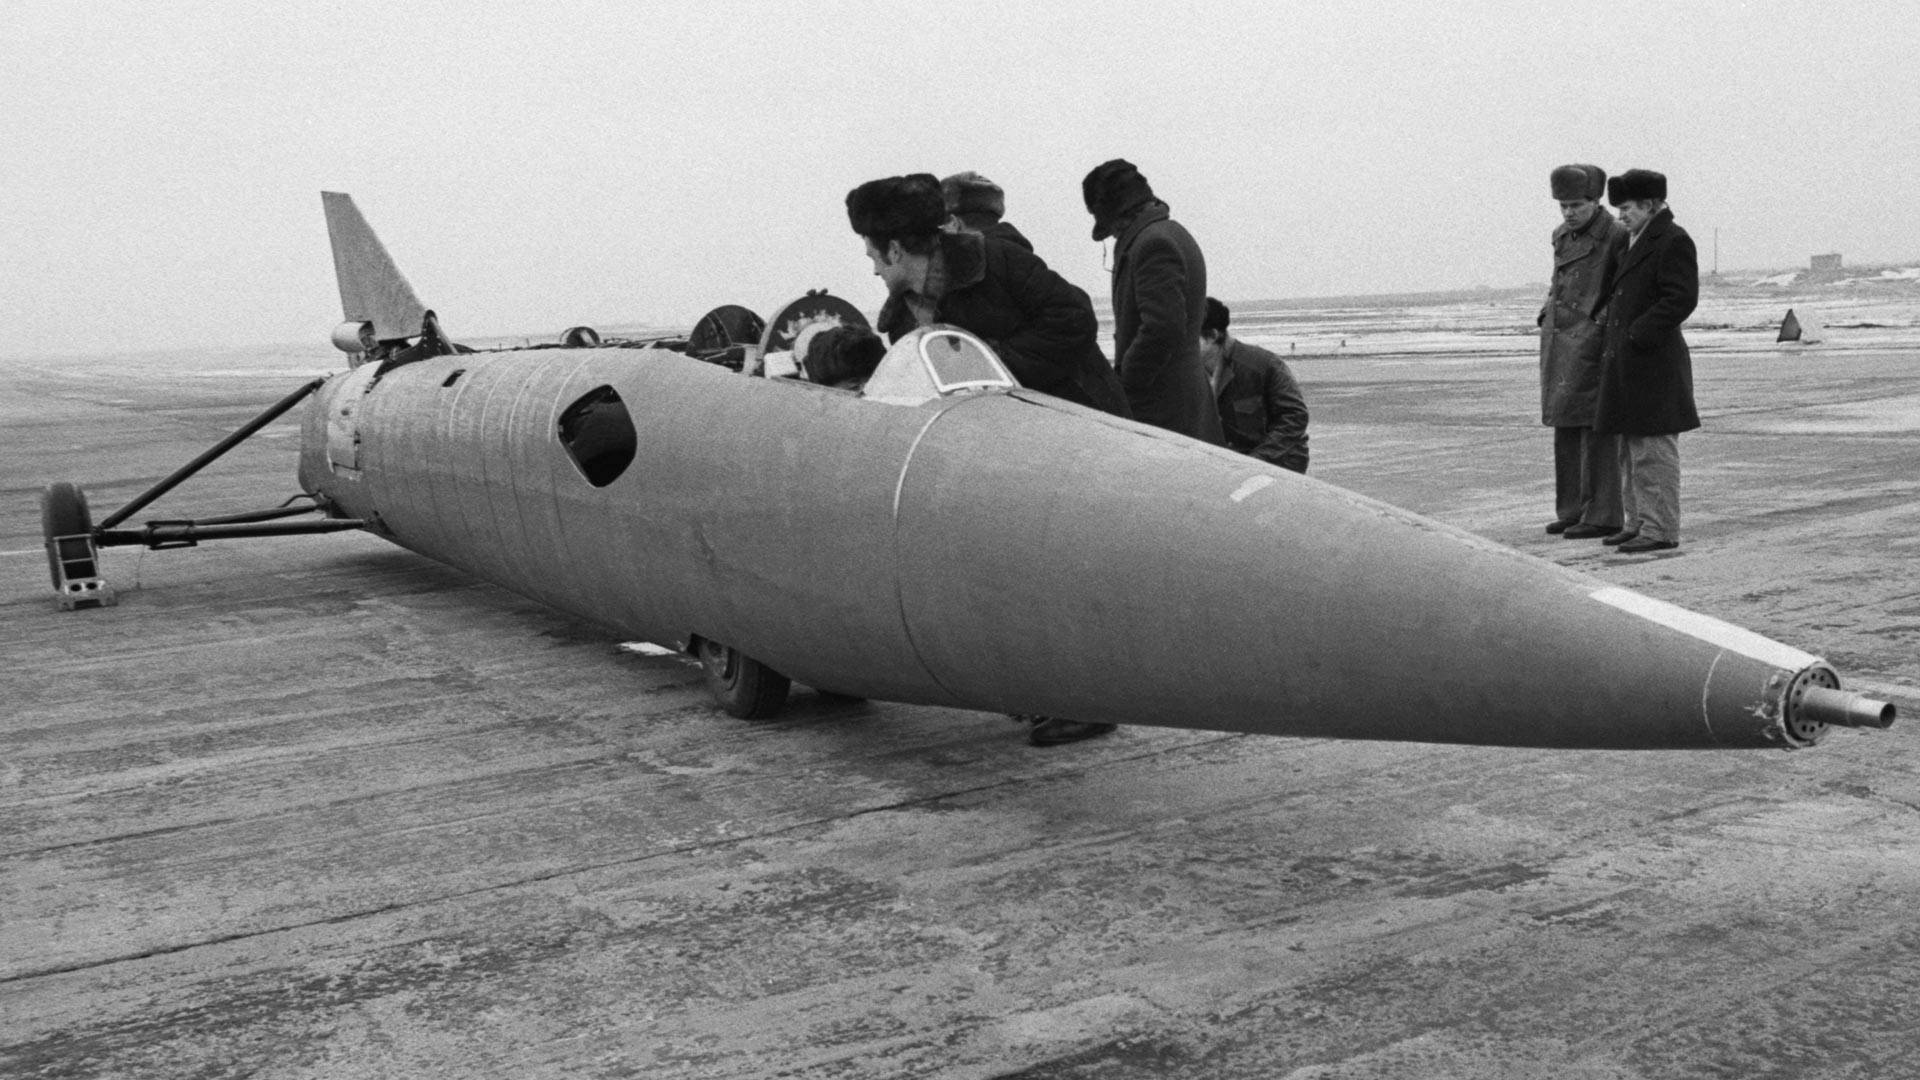 Sovjetski turboreaktivni avtomobil HADI-9